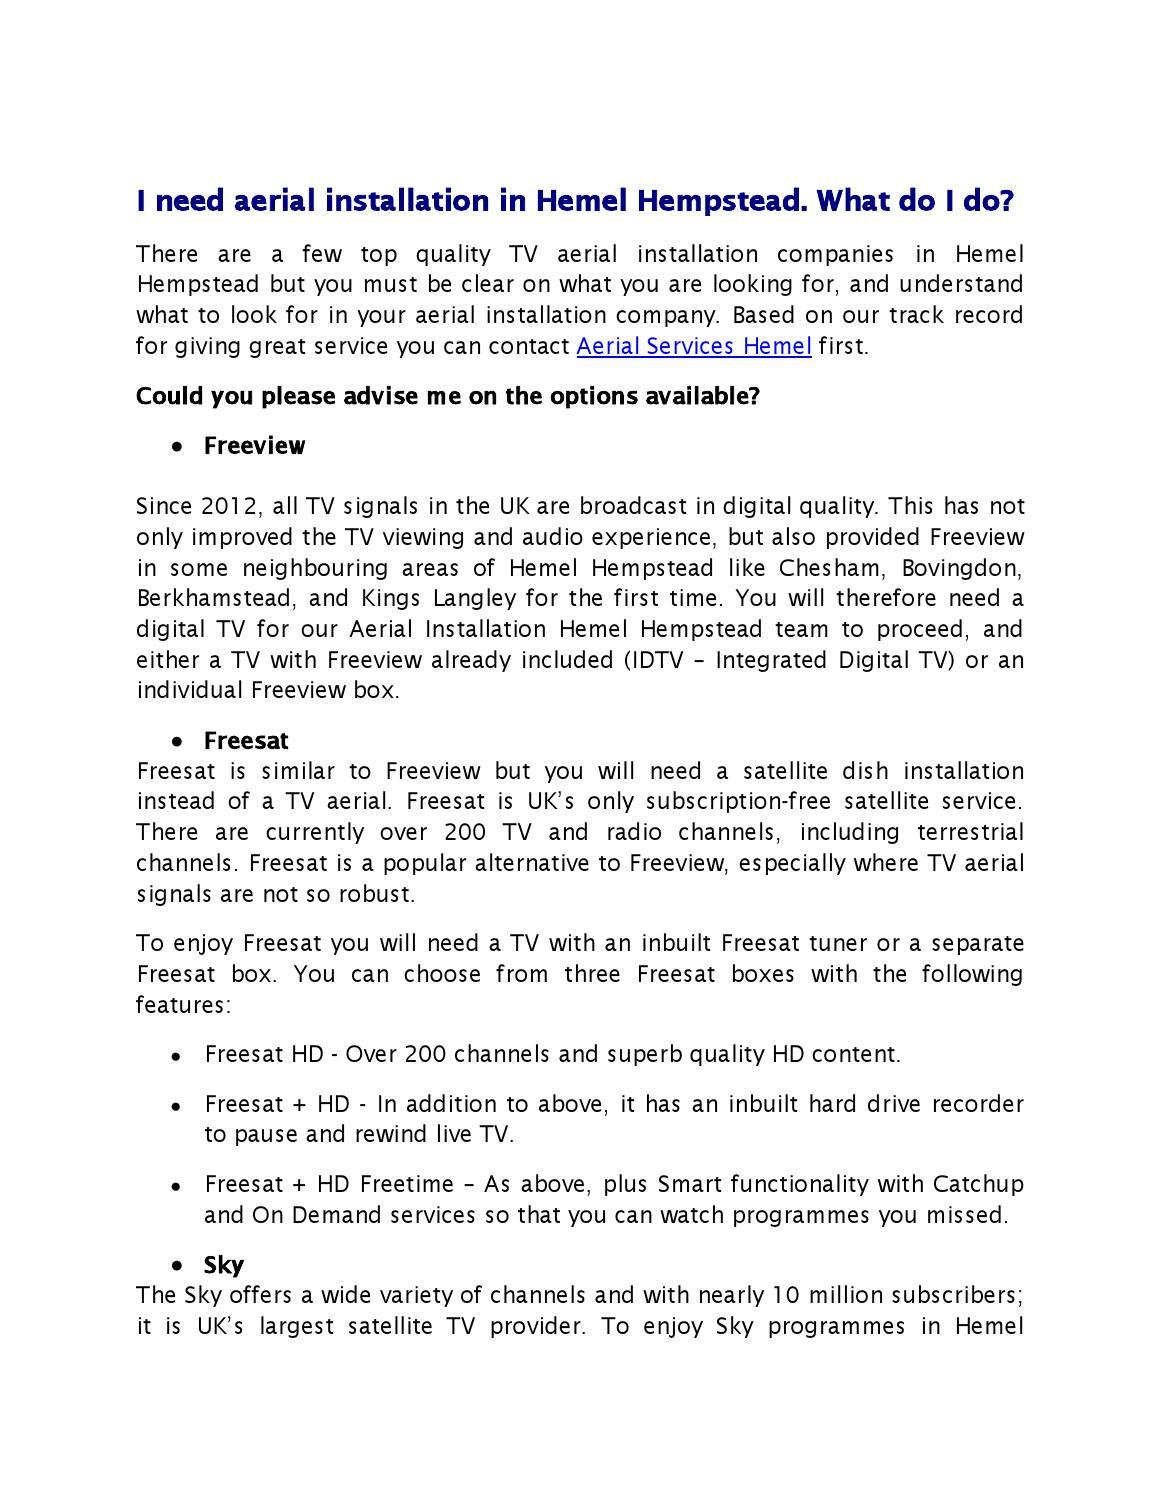 I need Aerial Installation in Hemel Hempstead  What do I do